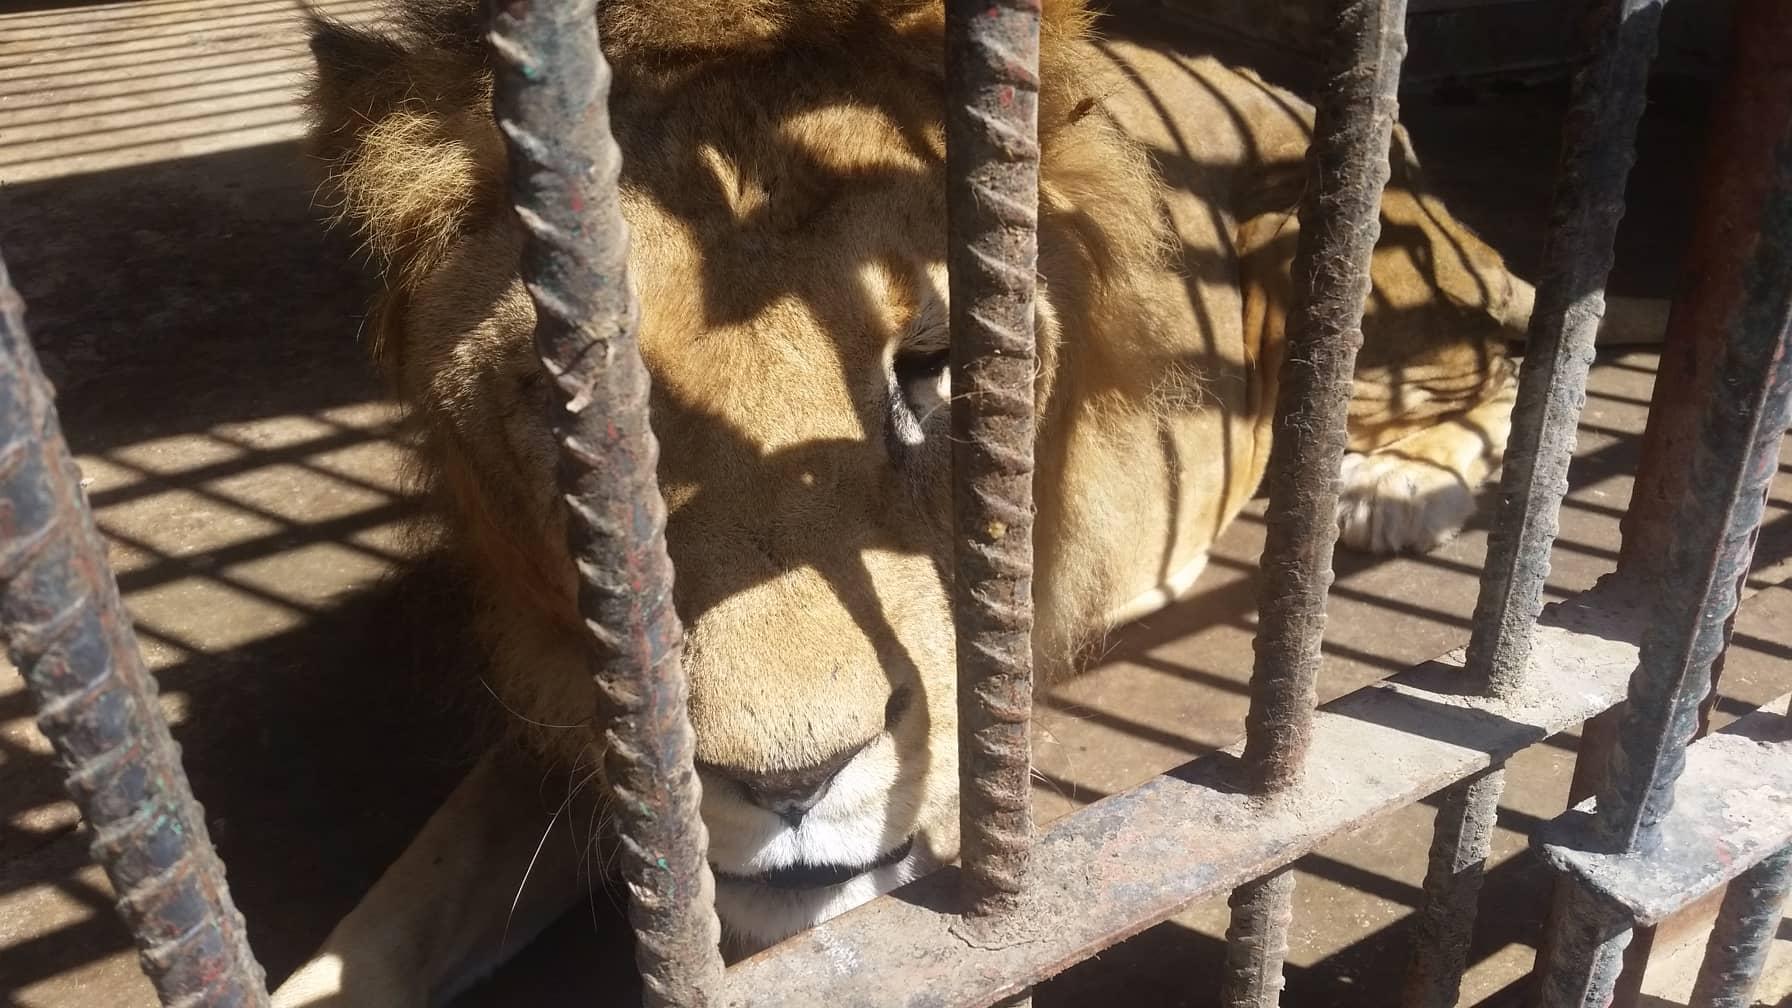 taiz zoo yemen 10 FEB 2019 OWAP-AR copywrite Hisham pics.jpg